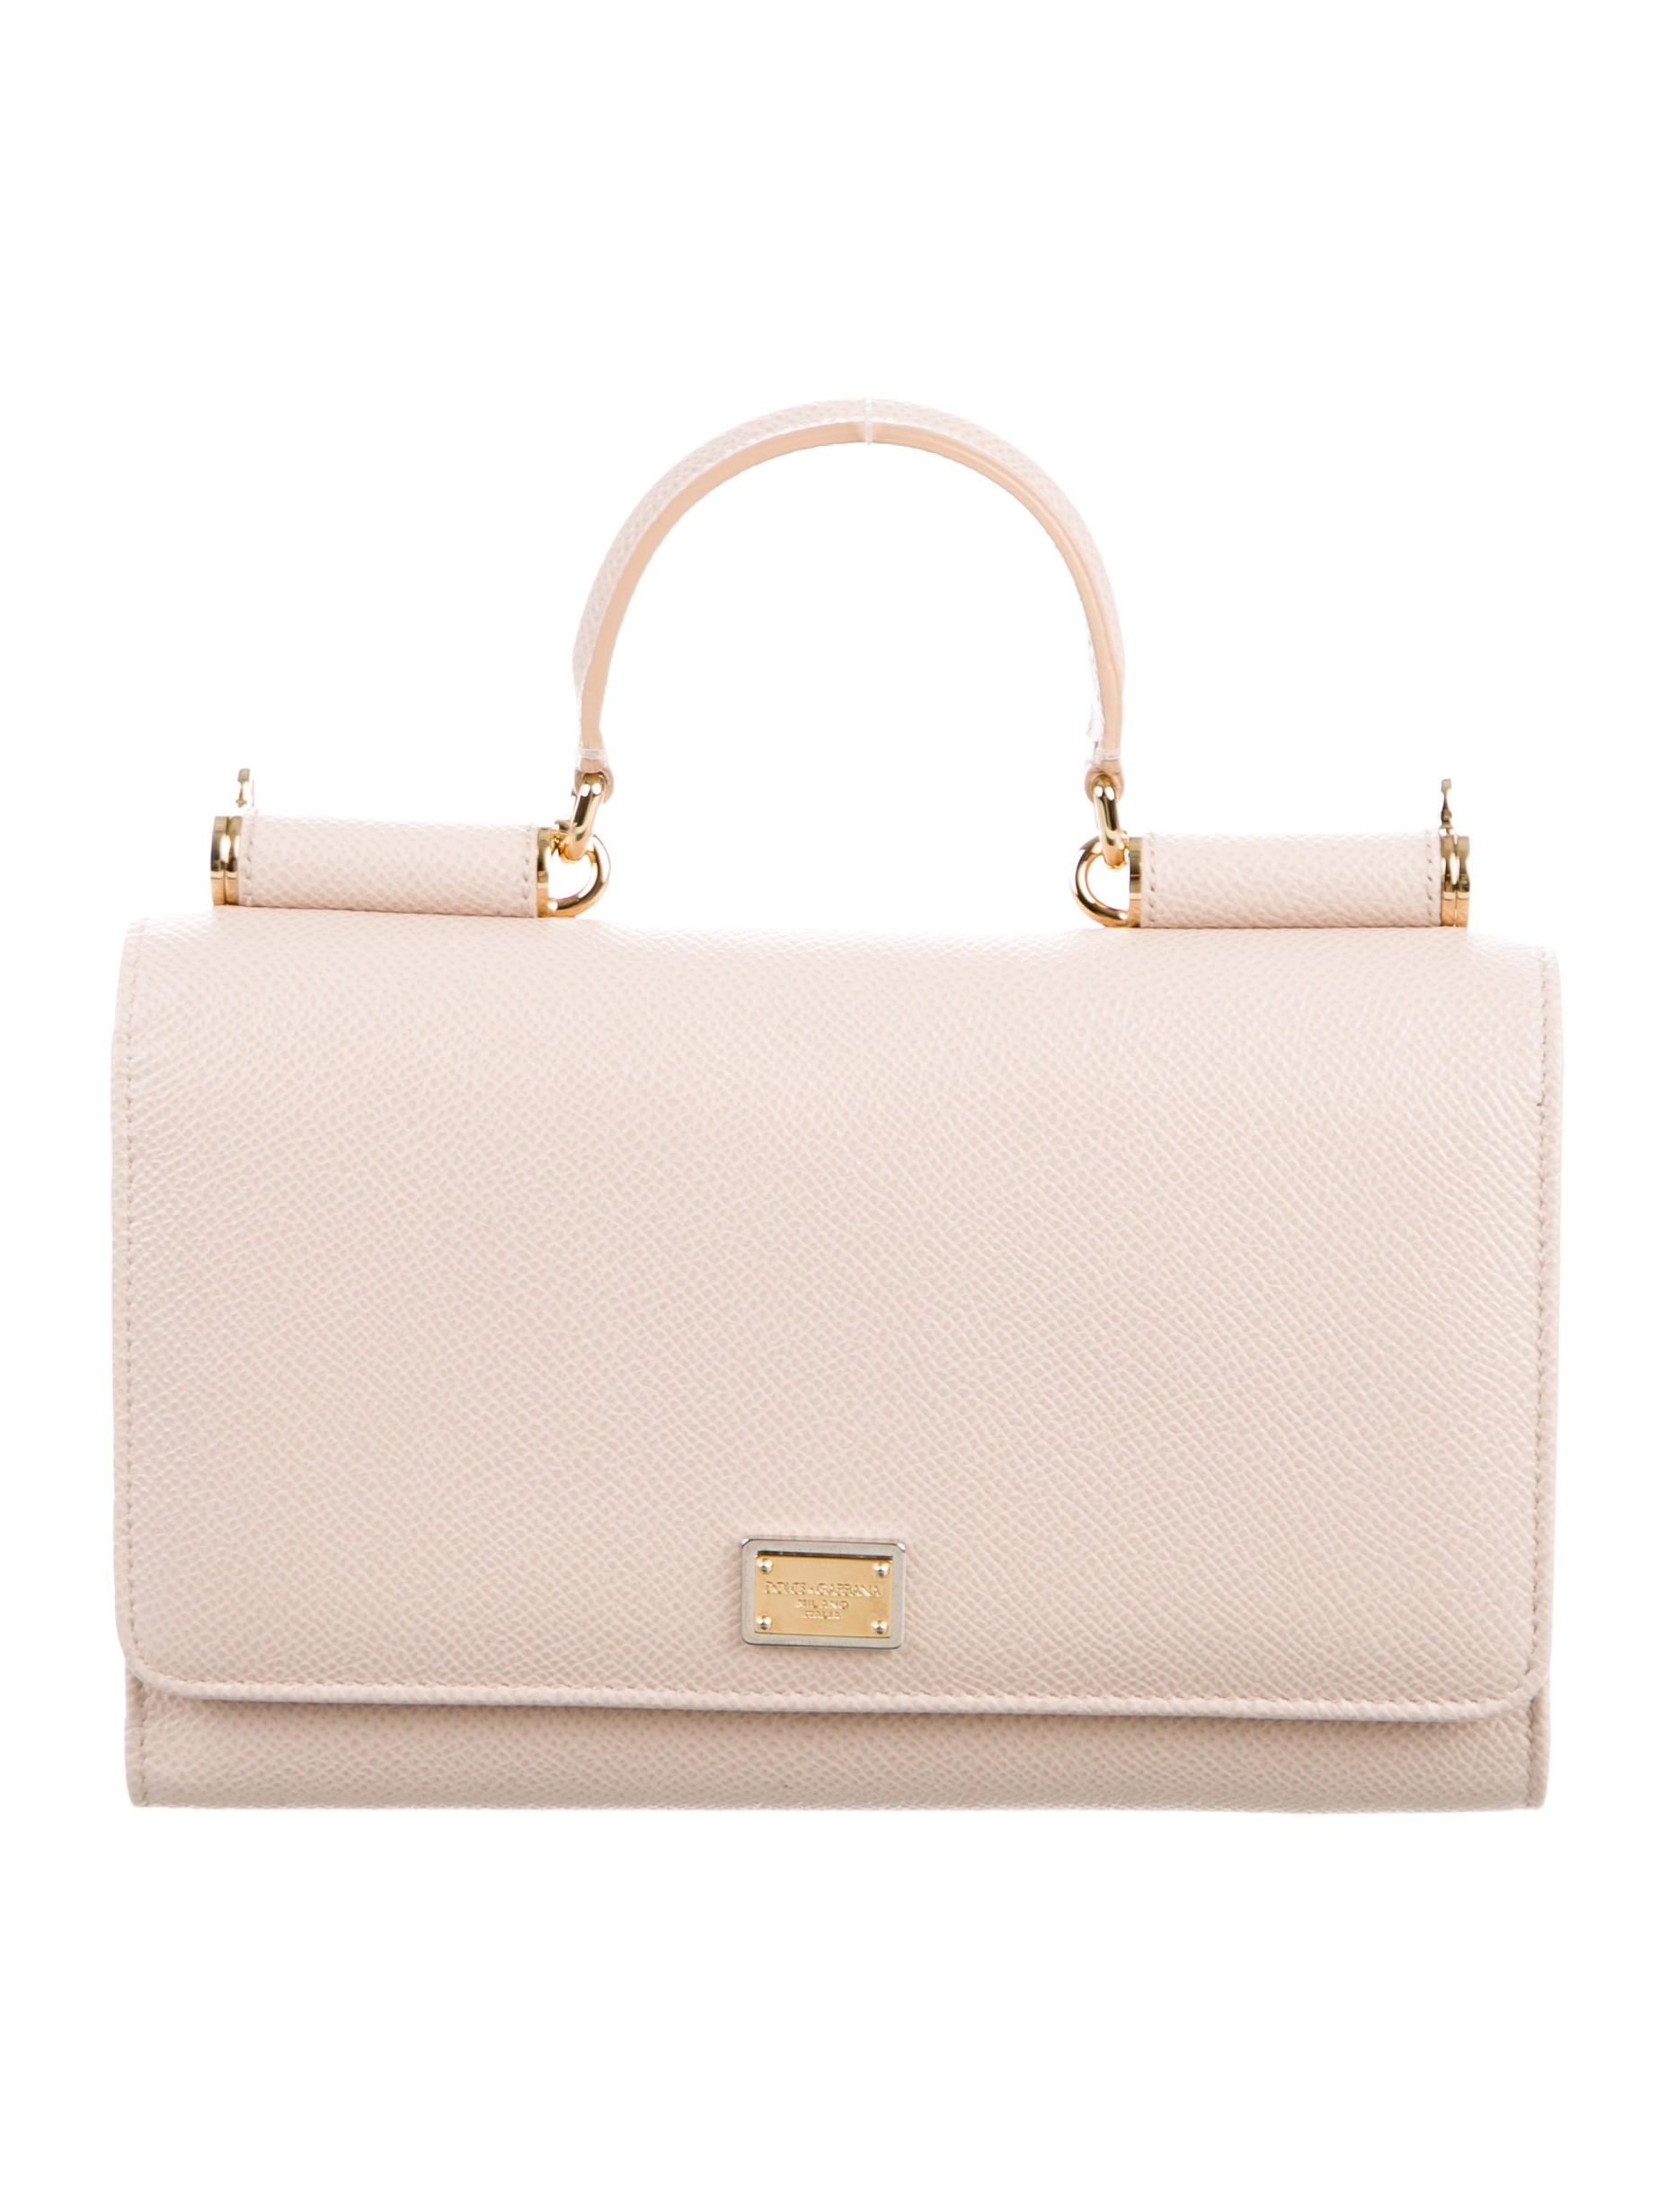 c3ab1ff00bb Dolce   Gabbana Miss Sicily Small Lipstick Crossbody - Handbags ...